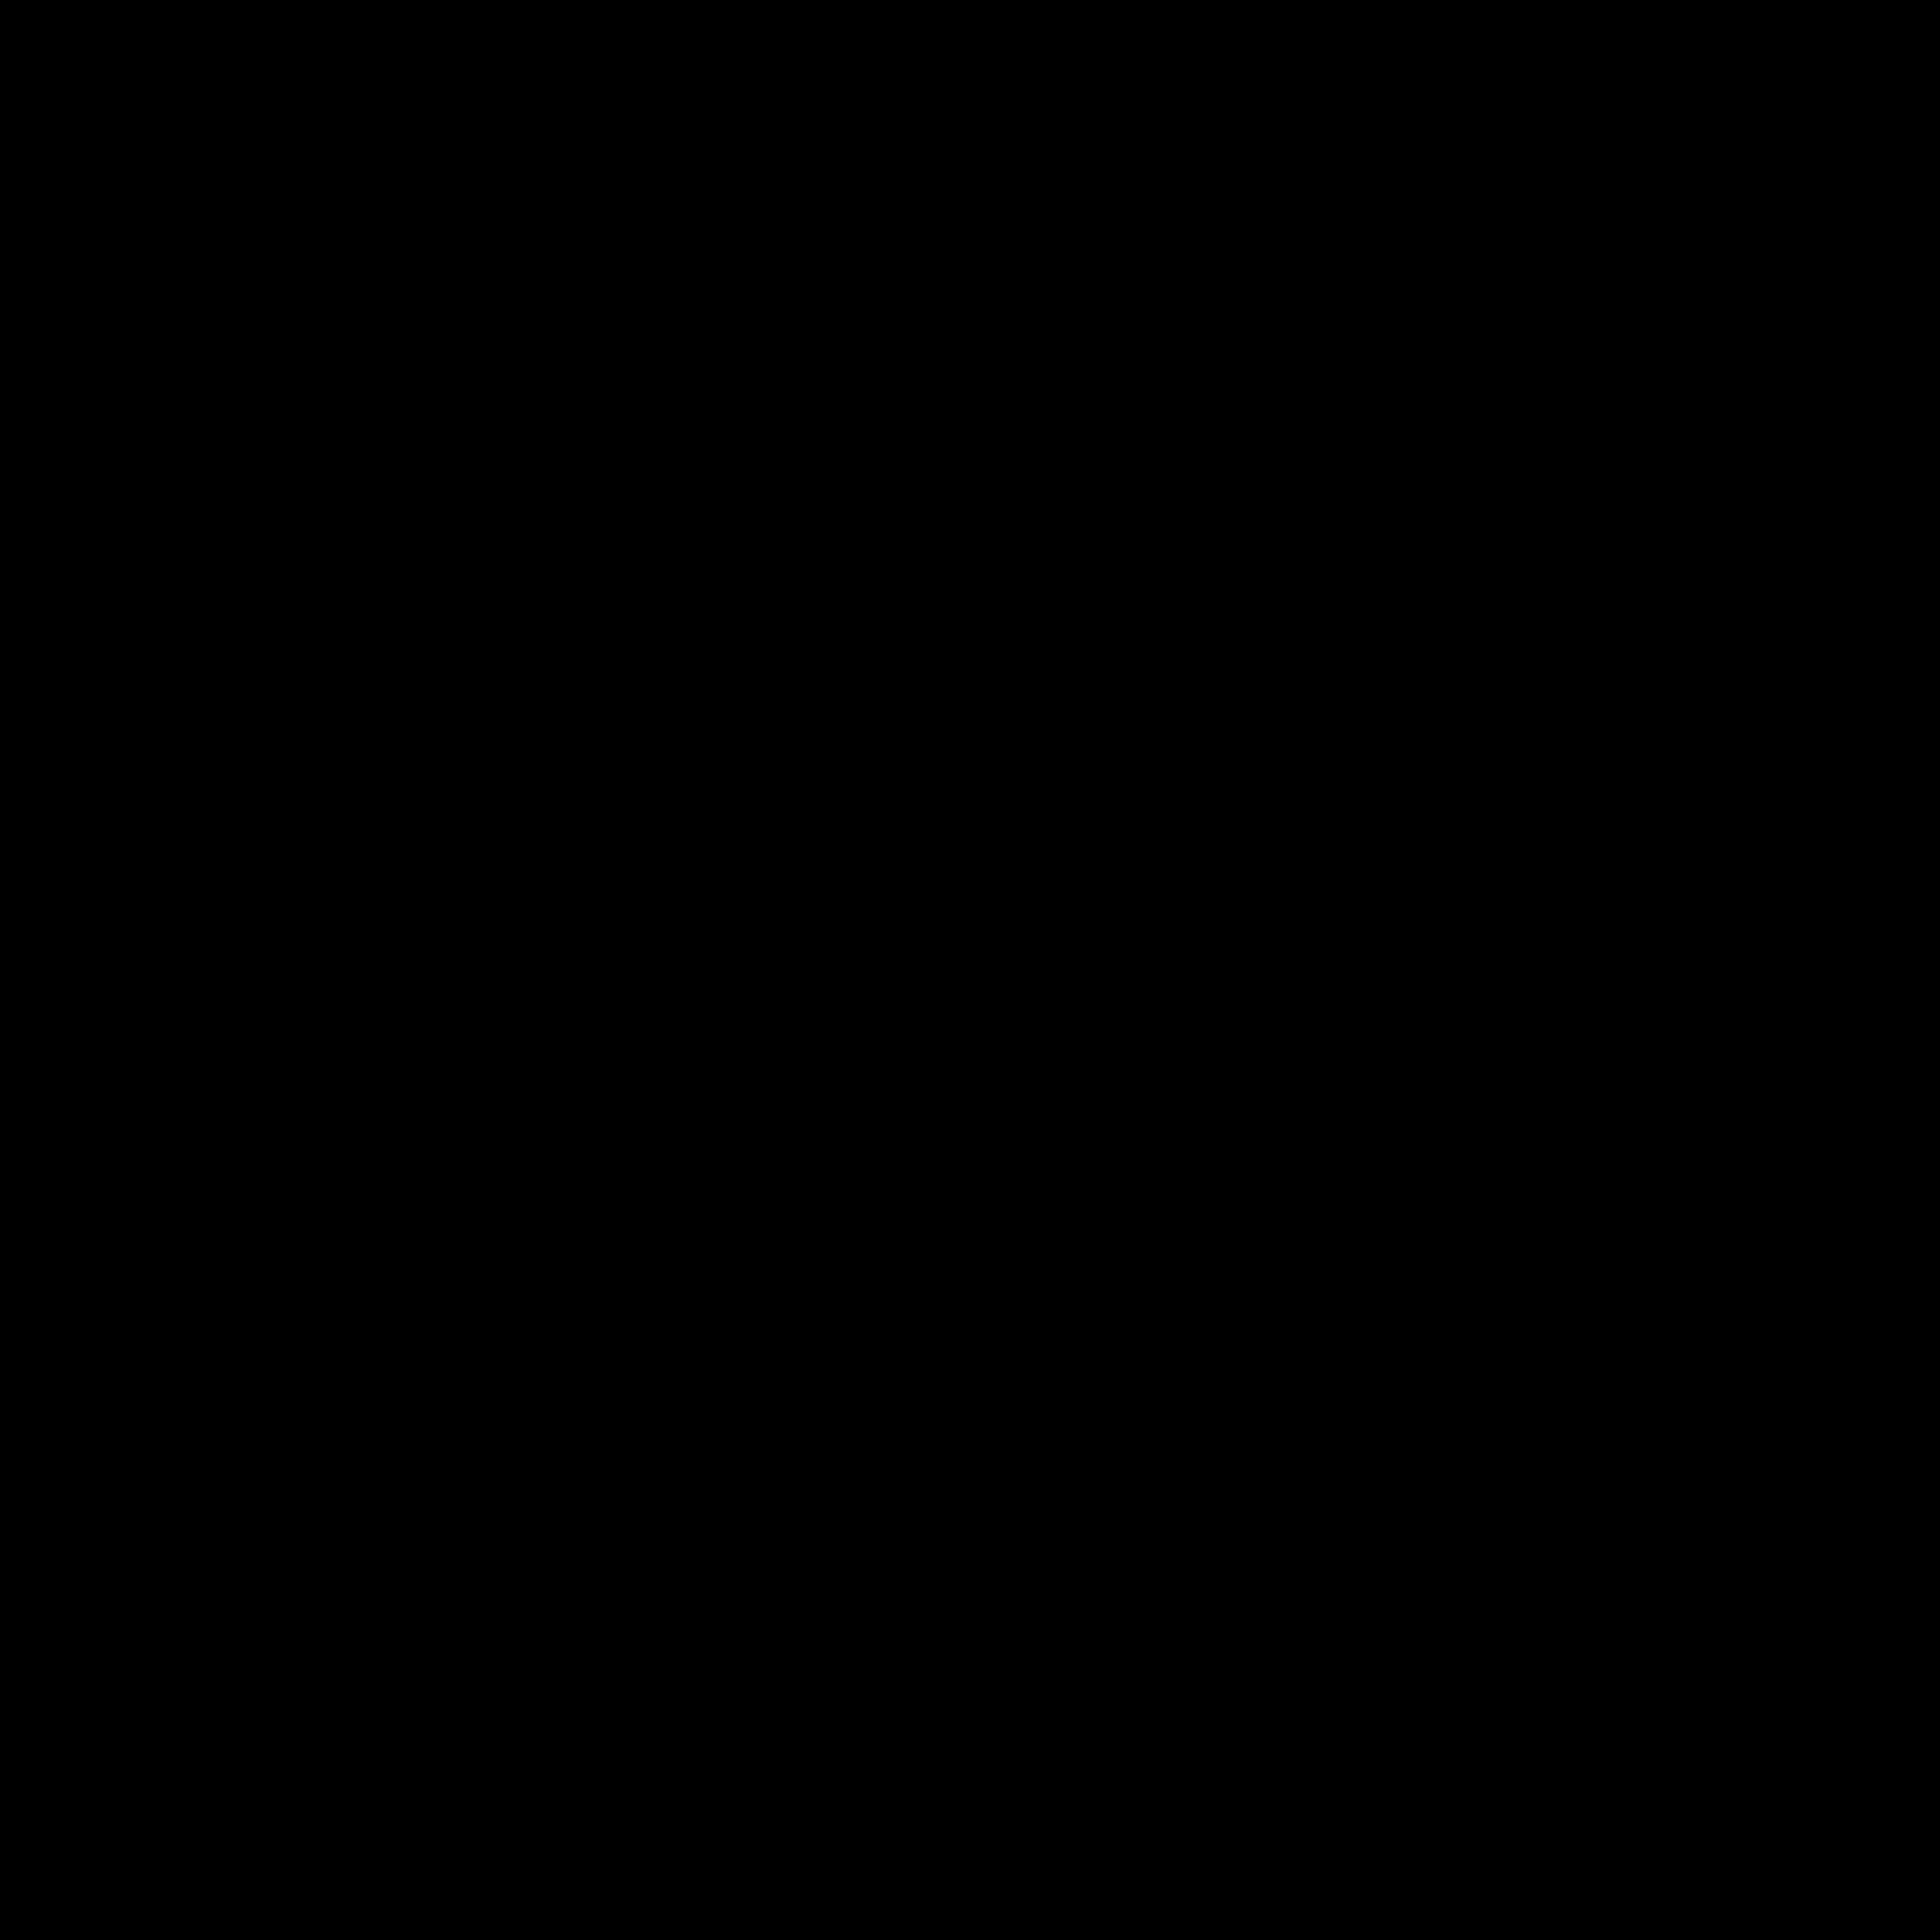 Black and white money sign